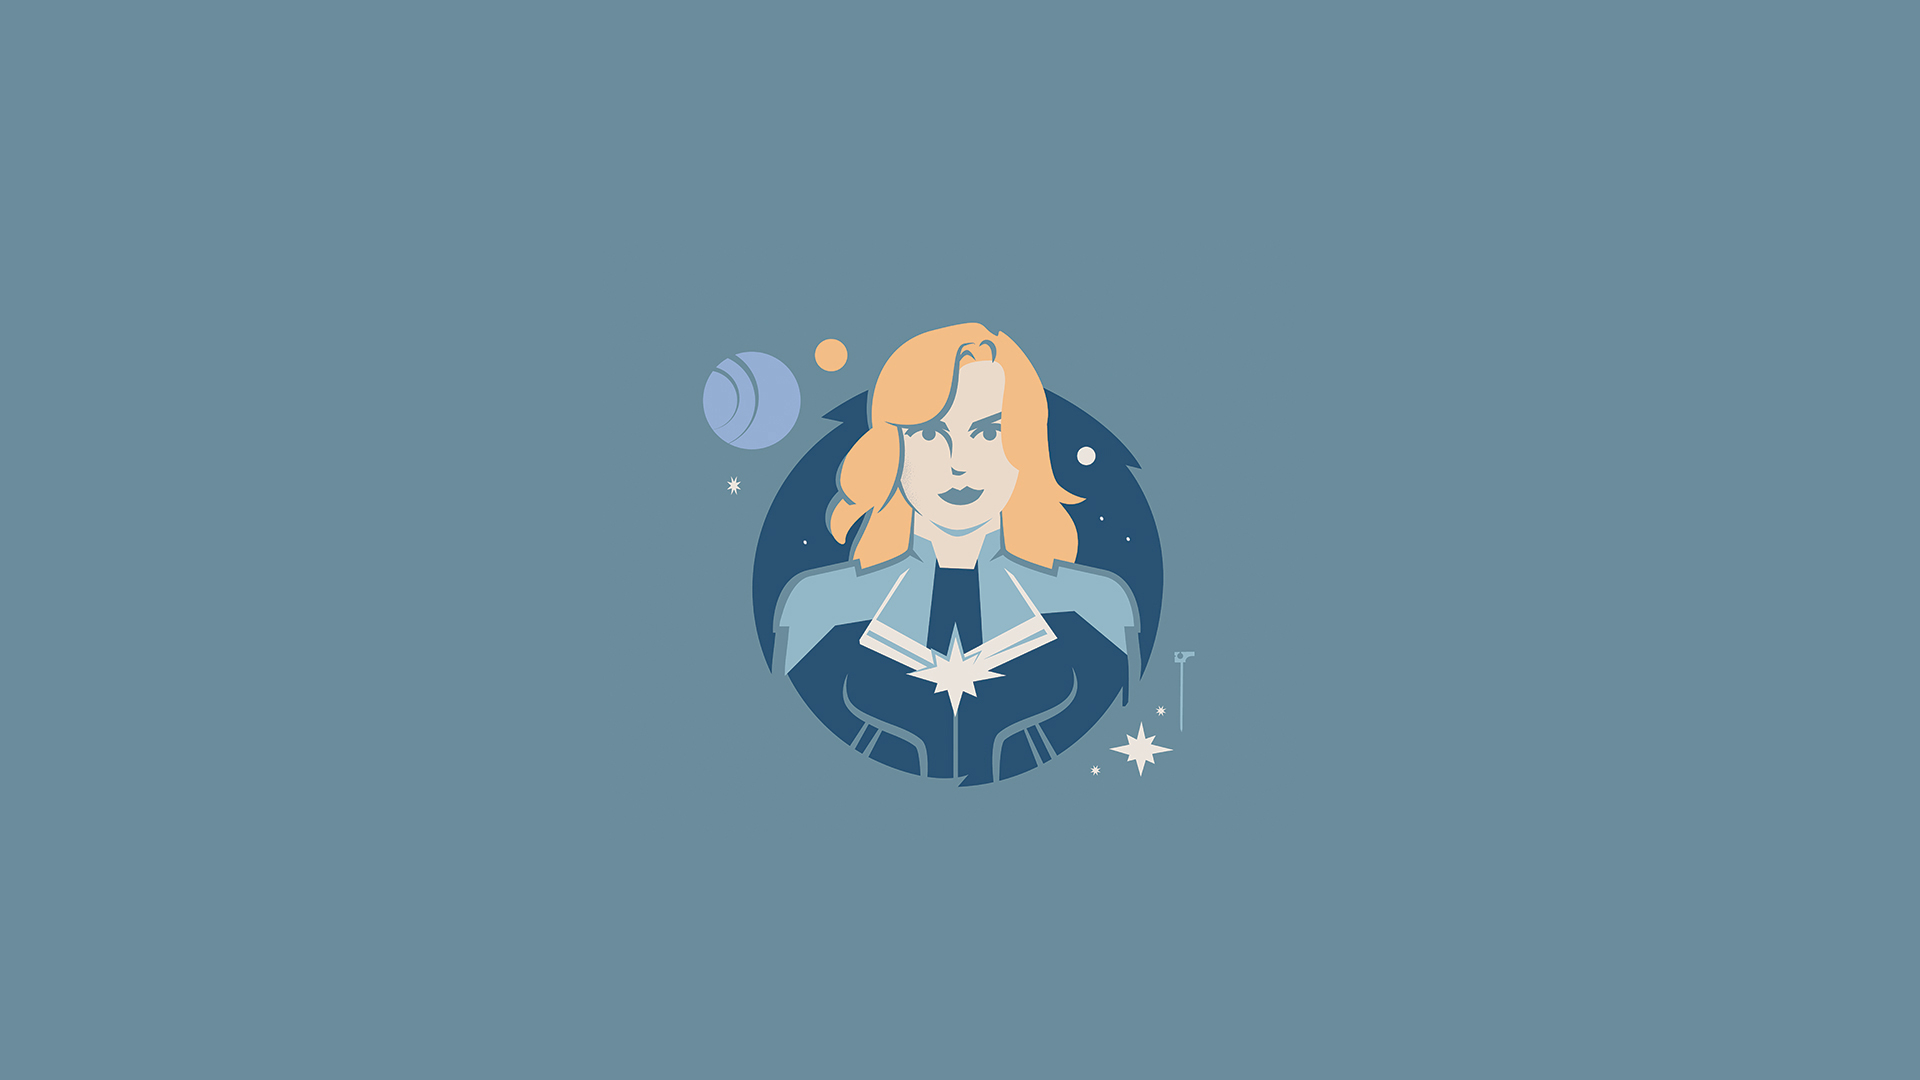 Captain Marvel Minimalist Artwork Wallpaper Hd Minimalist